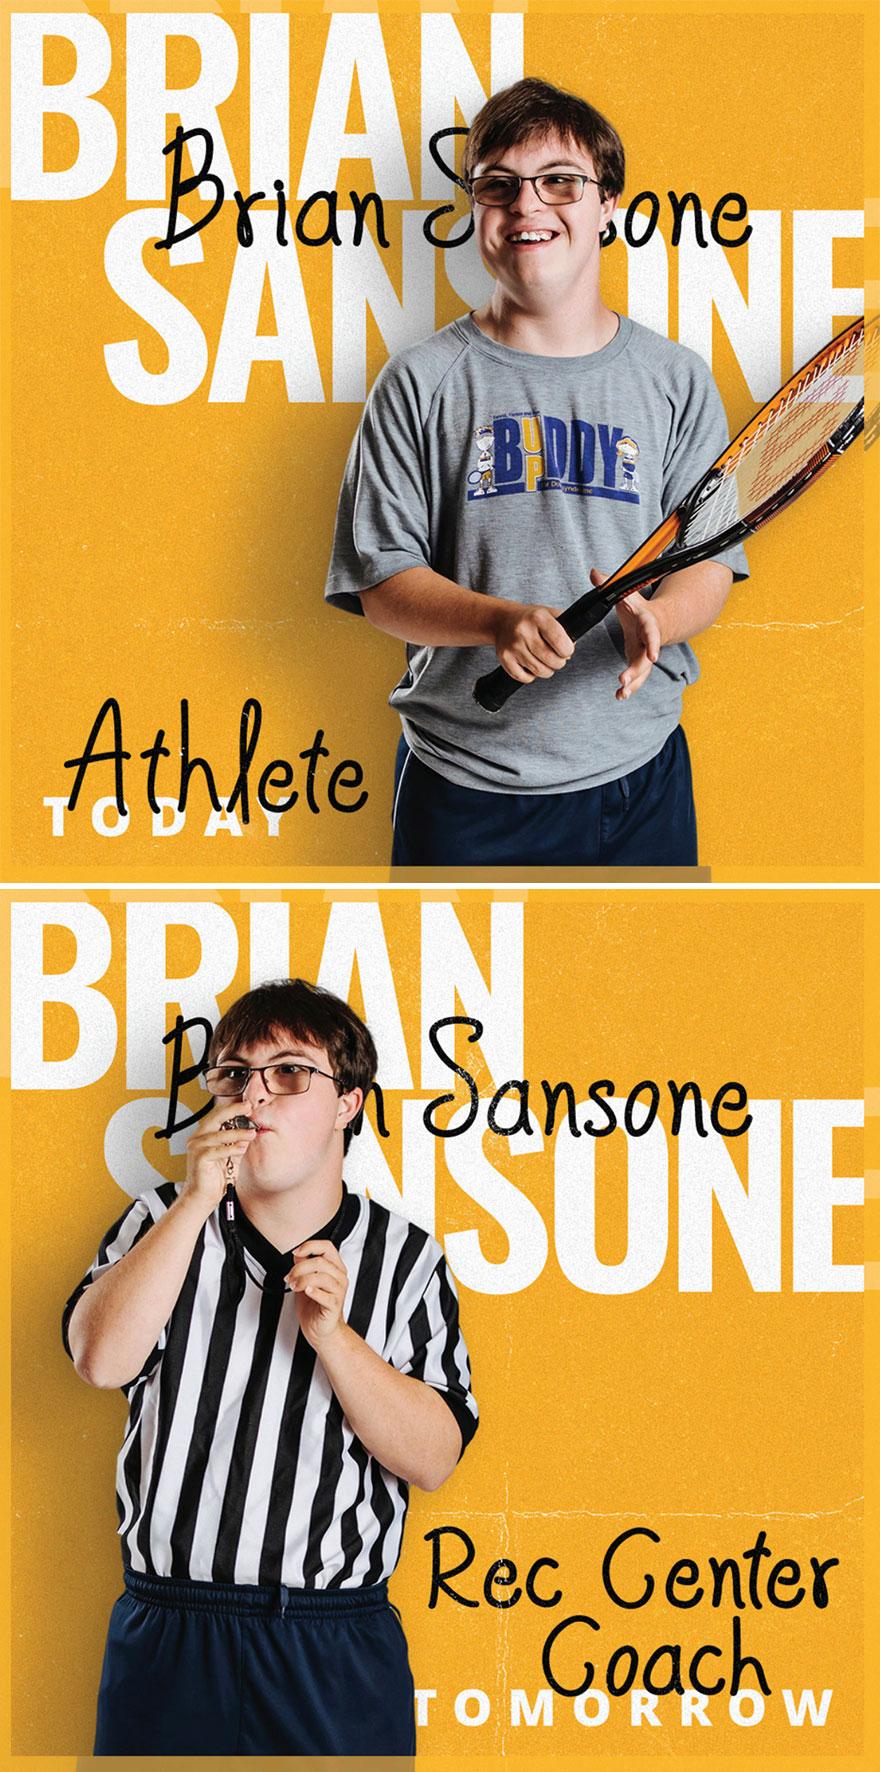 Brian Sansone, Rec Center Coach